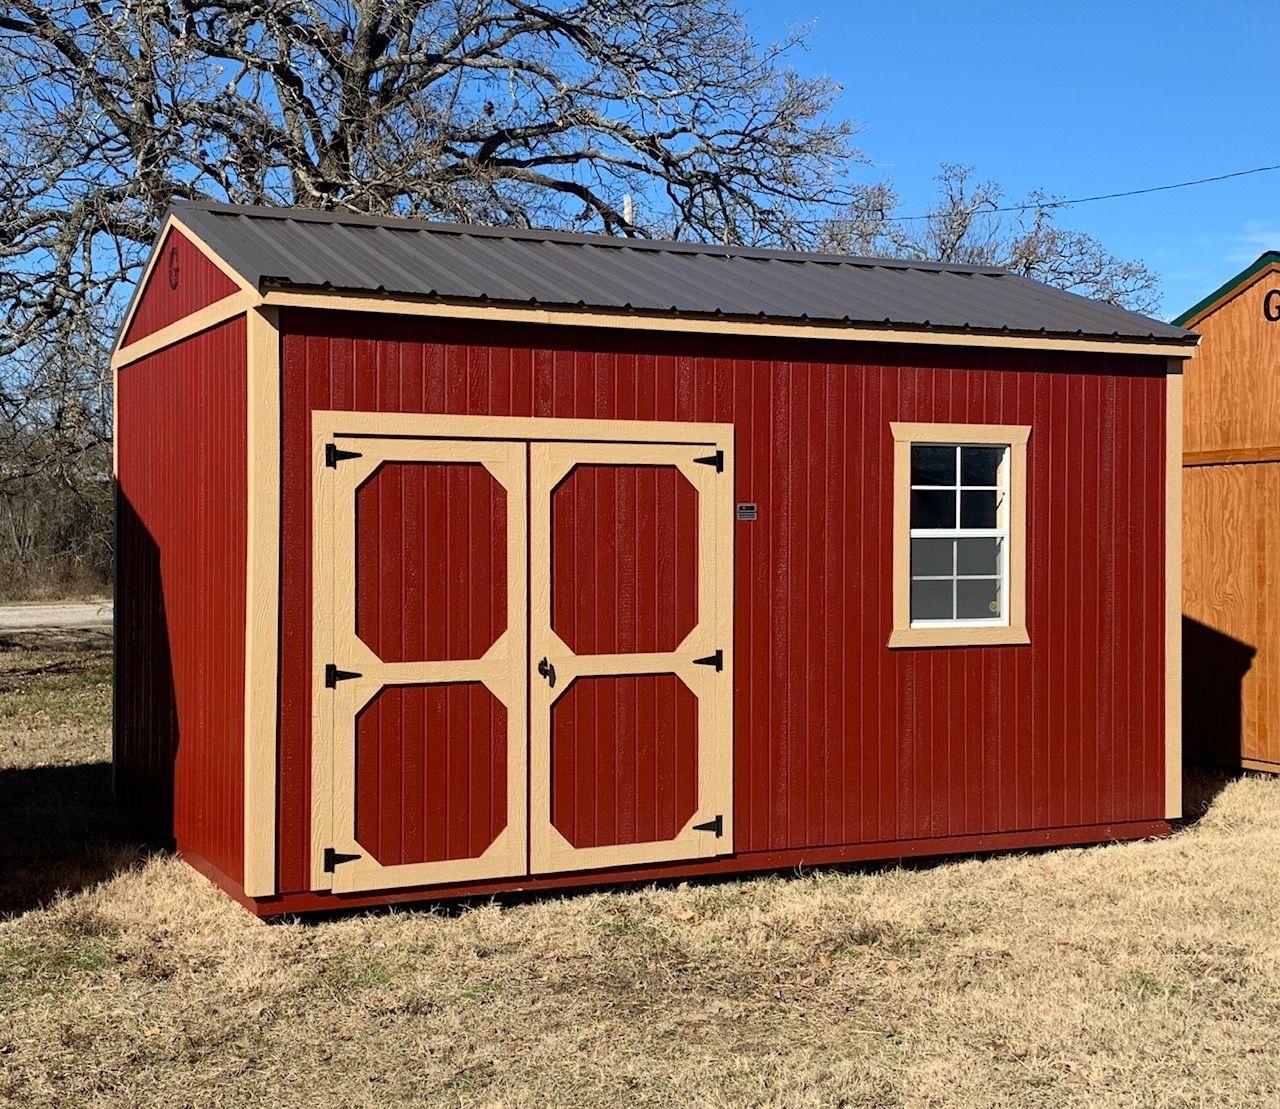 10 Off All Garden Sheds Shed Portable Buildings Backyard Storage Sheds